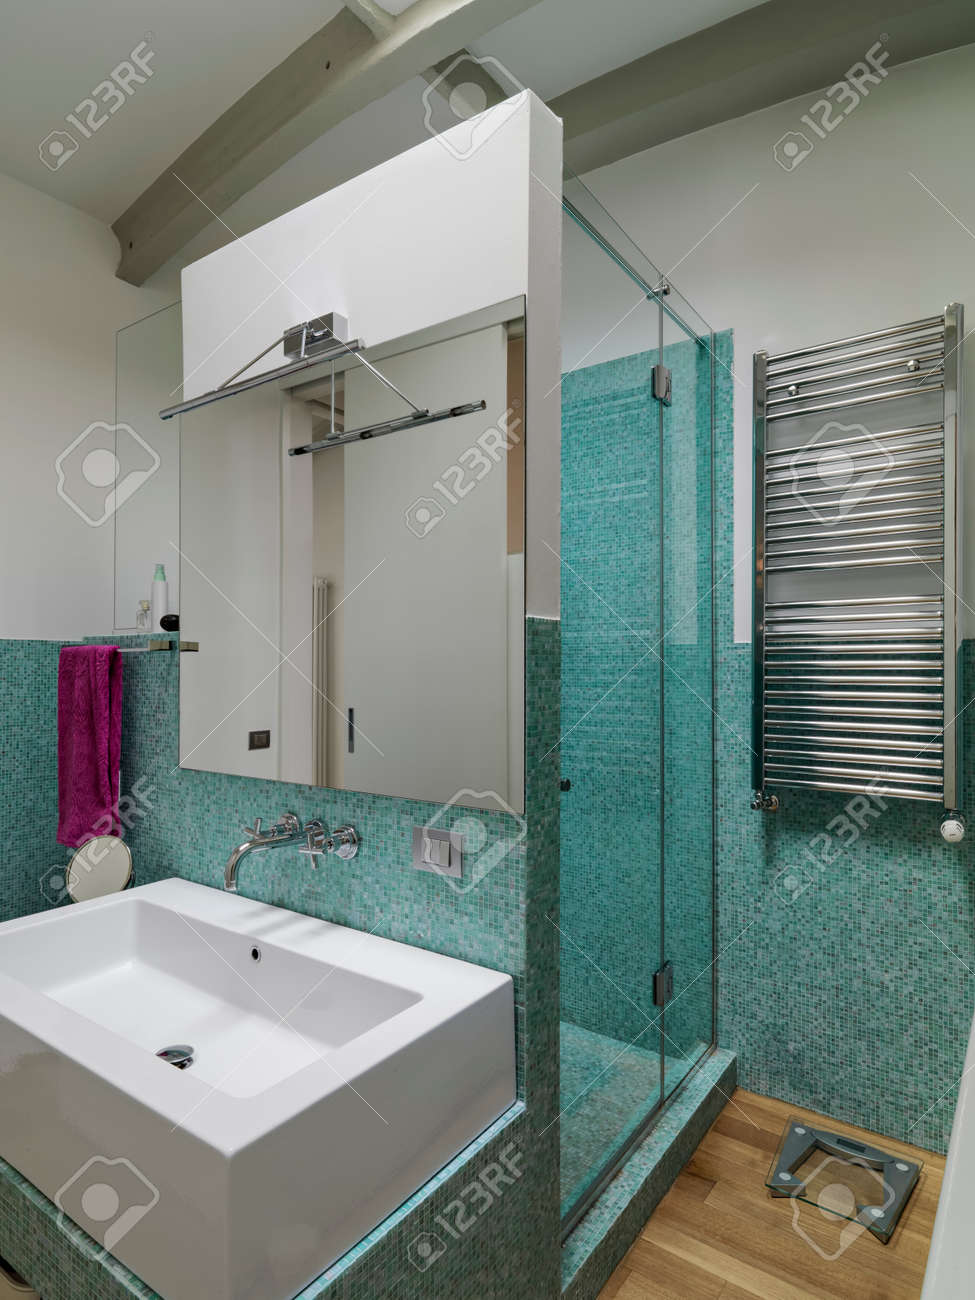 Mosaico Bagno Moderno.Bagni Moderni Mosaico Finest Latest Mosaico Bagno U Idee